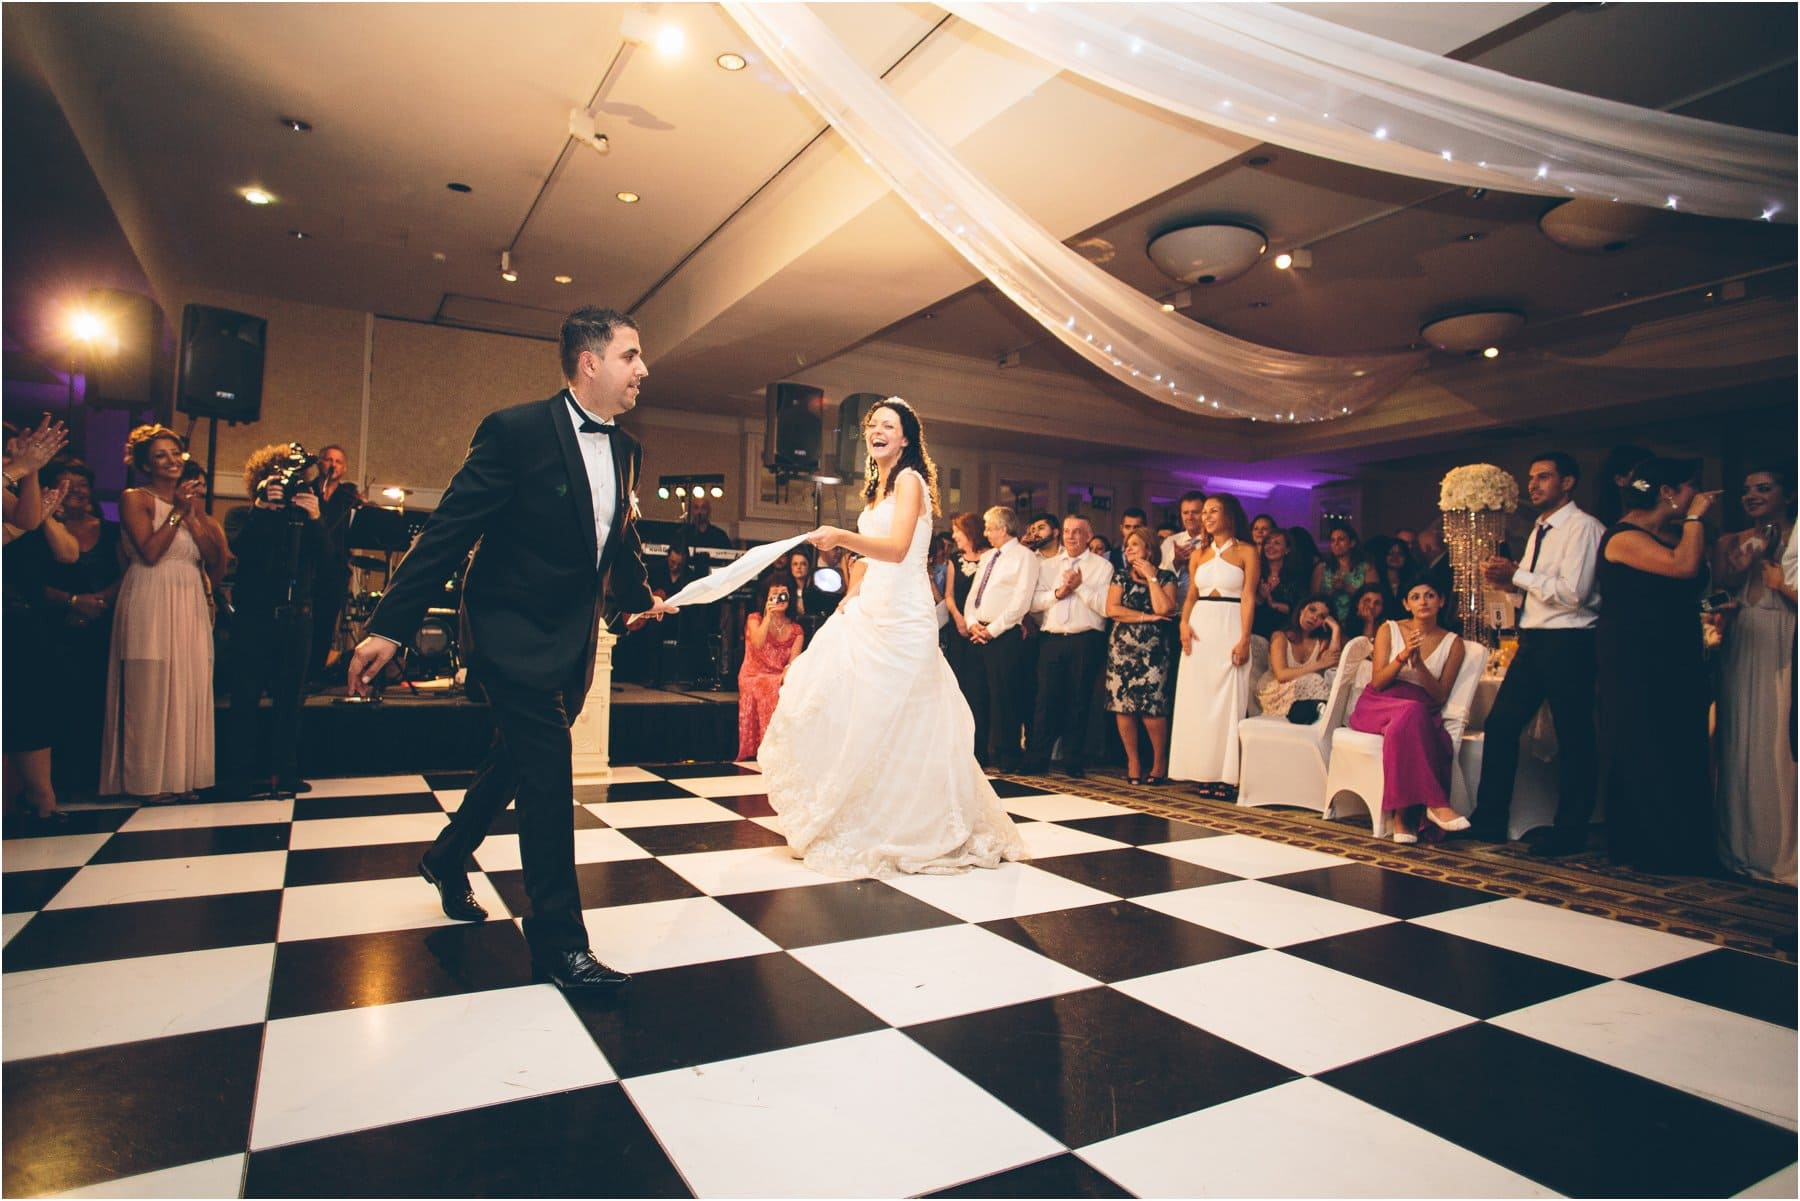 Midland_Manchester_Wedding_Photography_0123